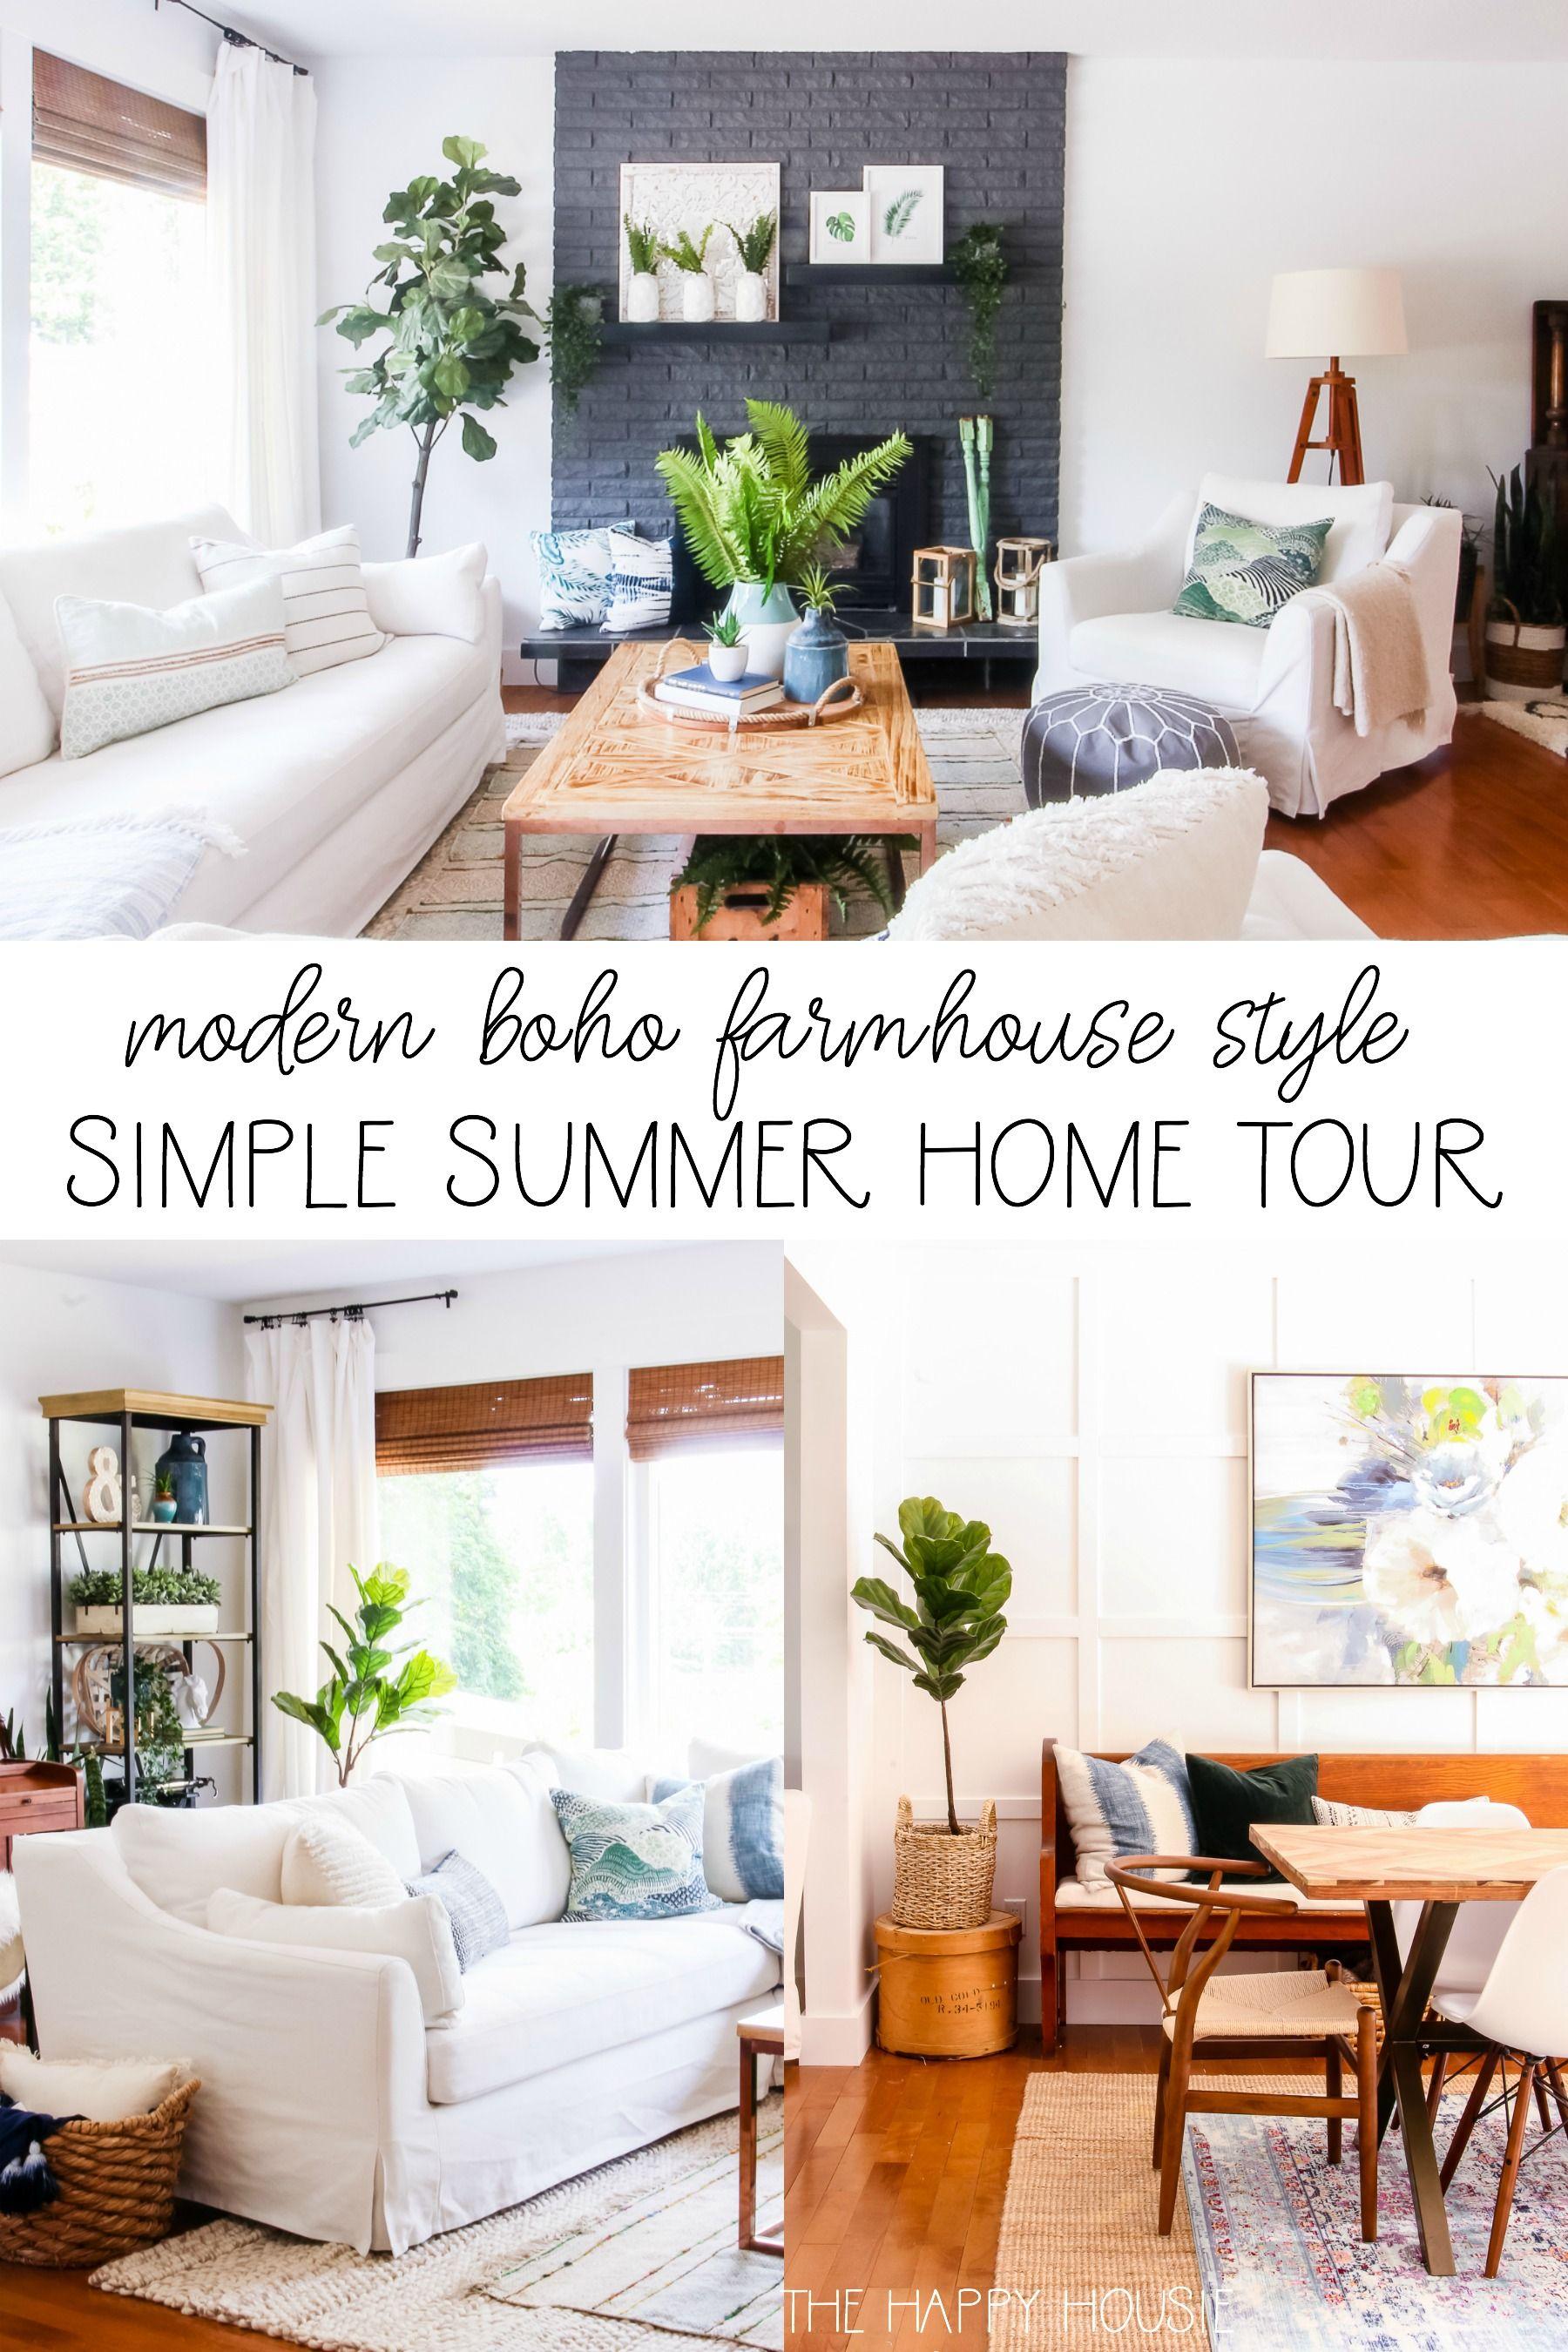 Modern Boho Farmhouse Style Simple Summer Home Tour The Happy Housie Farmhouse Dining Rooms Decor Country House Decor Farm House Living Room